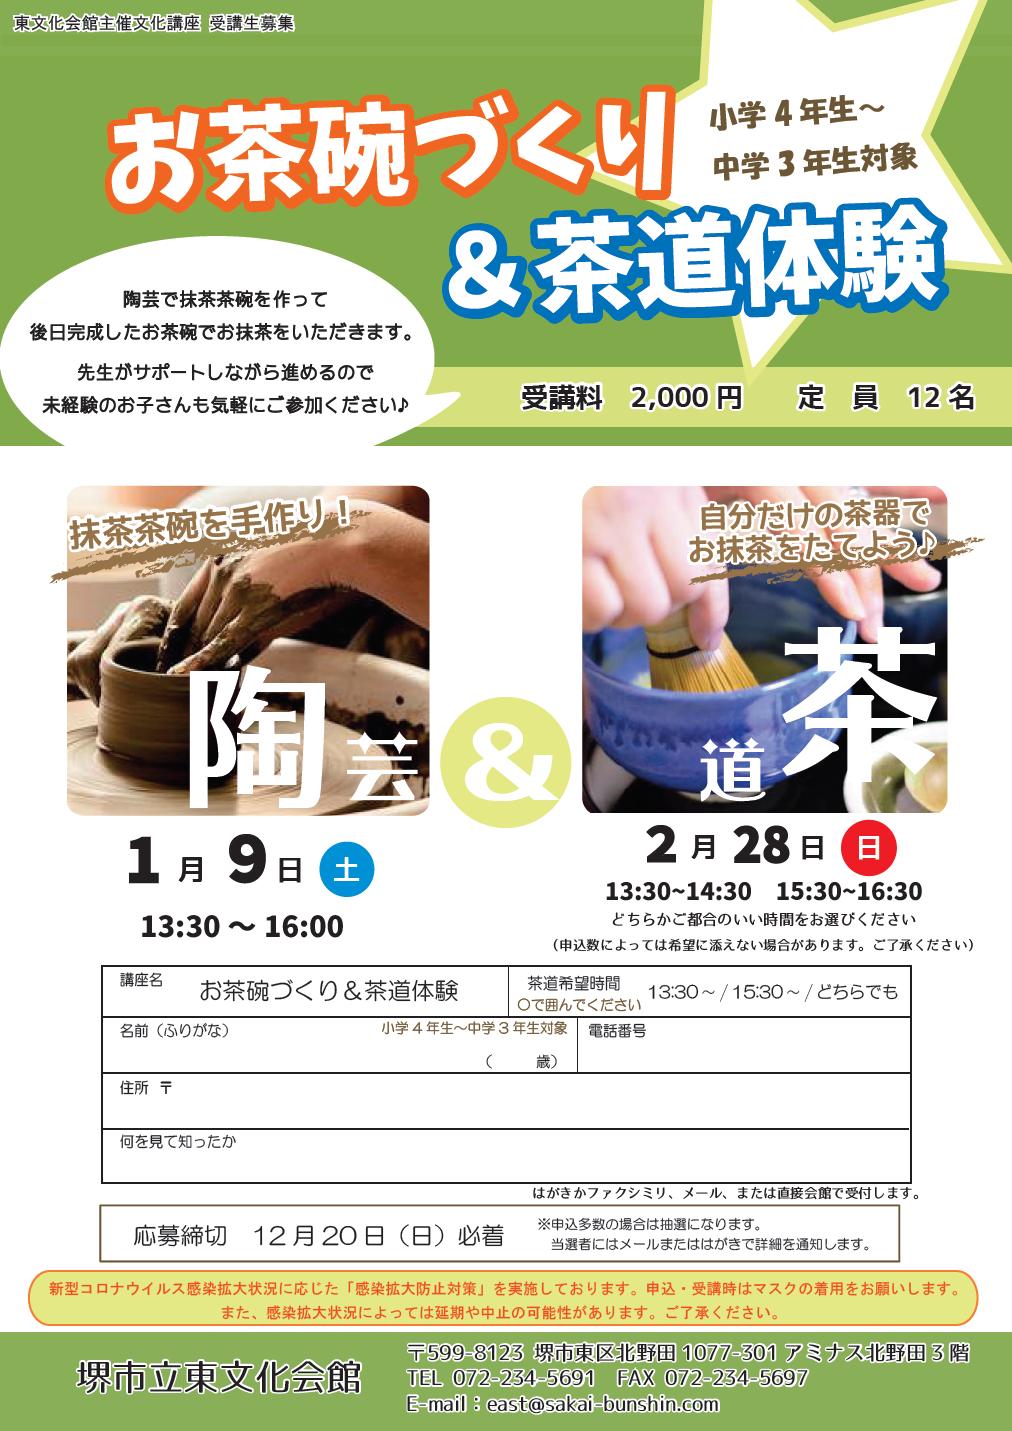 東文化会館 お茶碗づくり&茶道体験(小学4年生~中学3年生対象)